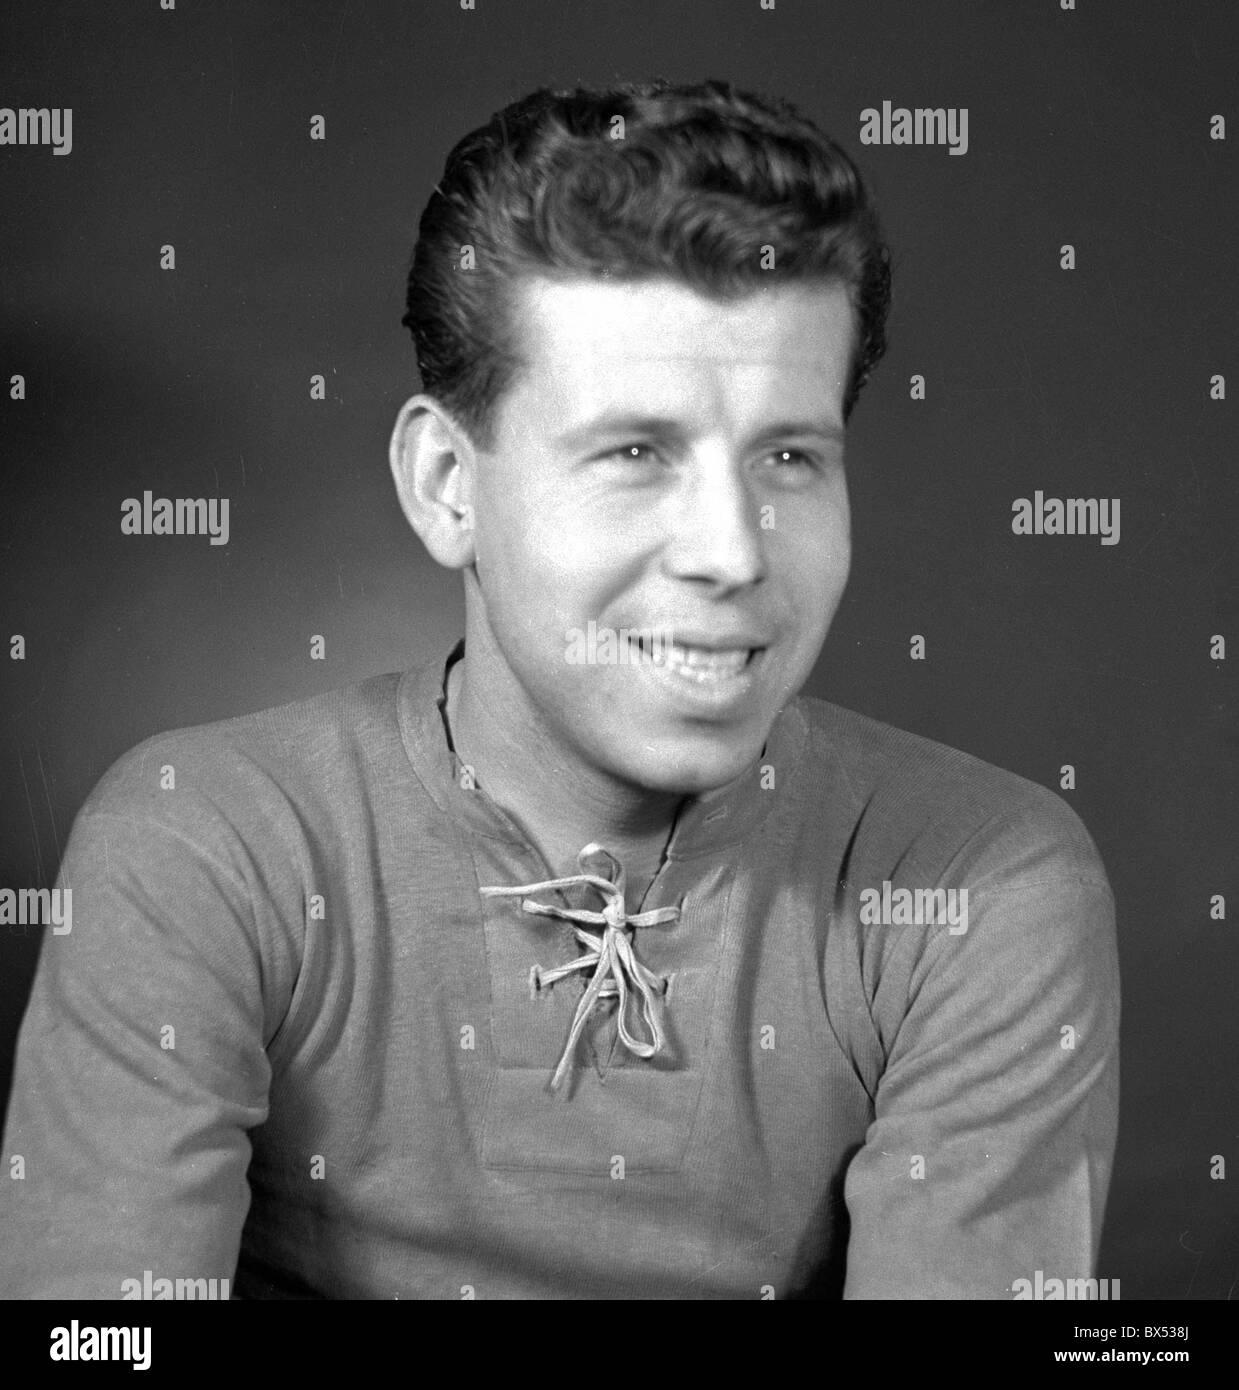 Czech soccer player Josef Masopust in 1958 CTK Zdenek